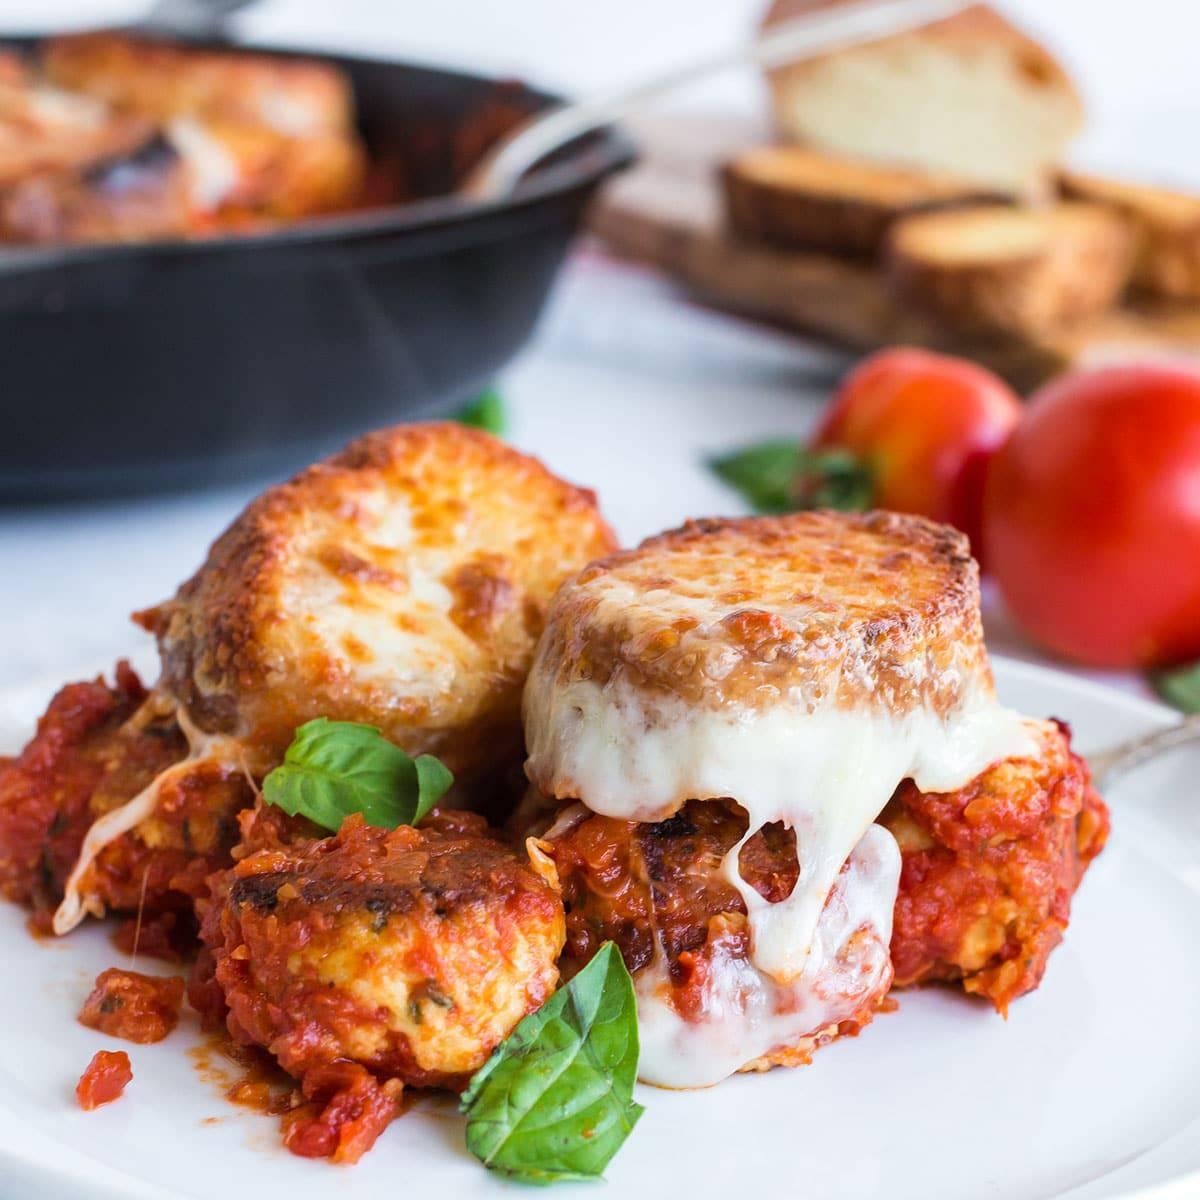 Plate of meatbasll sub casserole with basil garnish